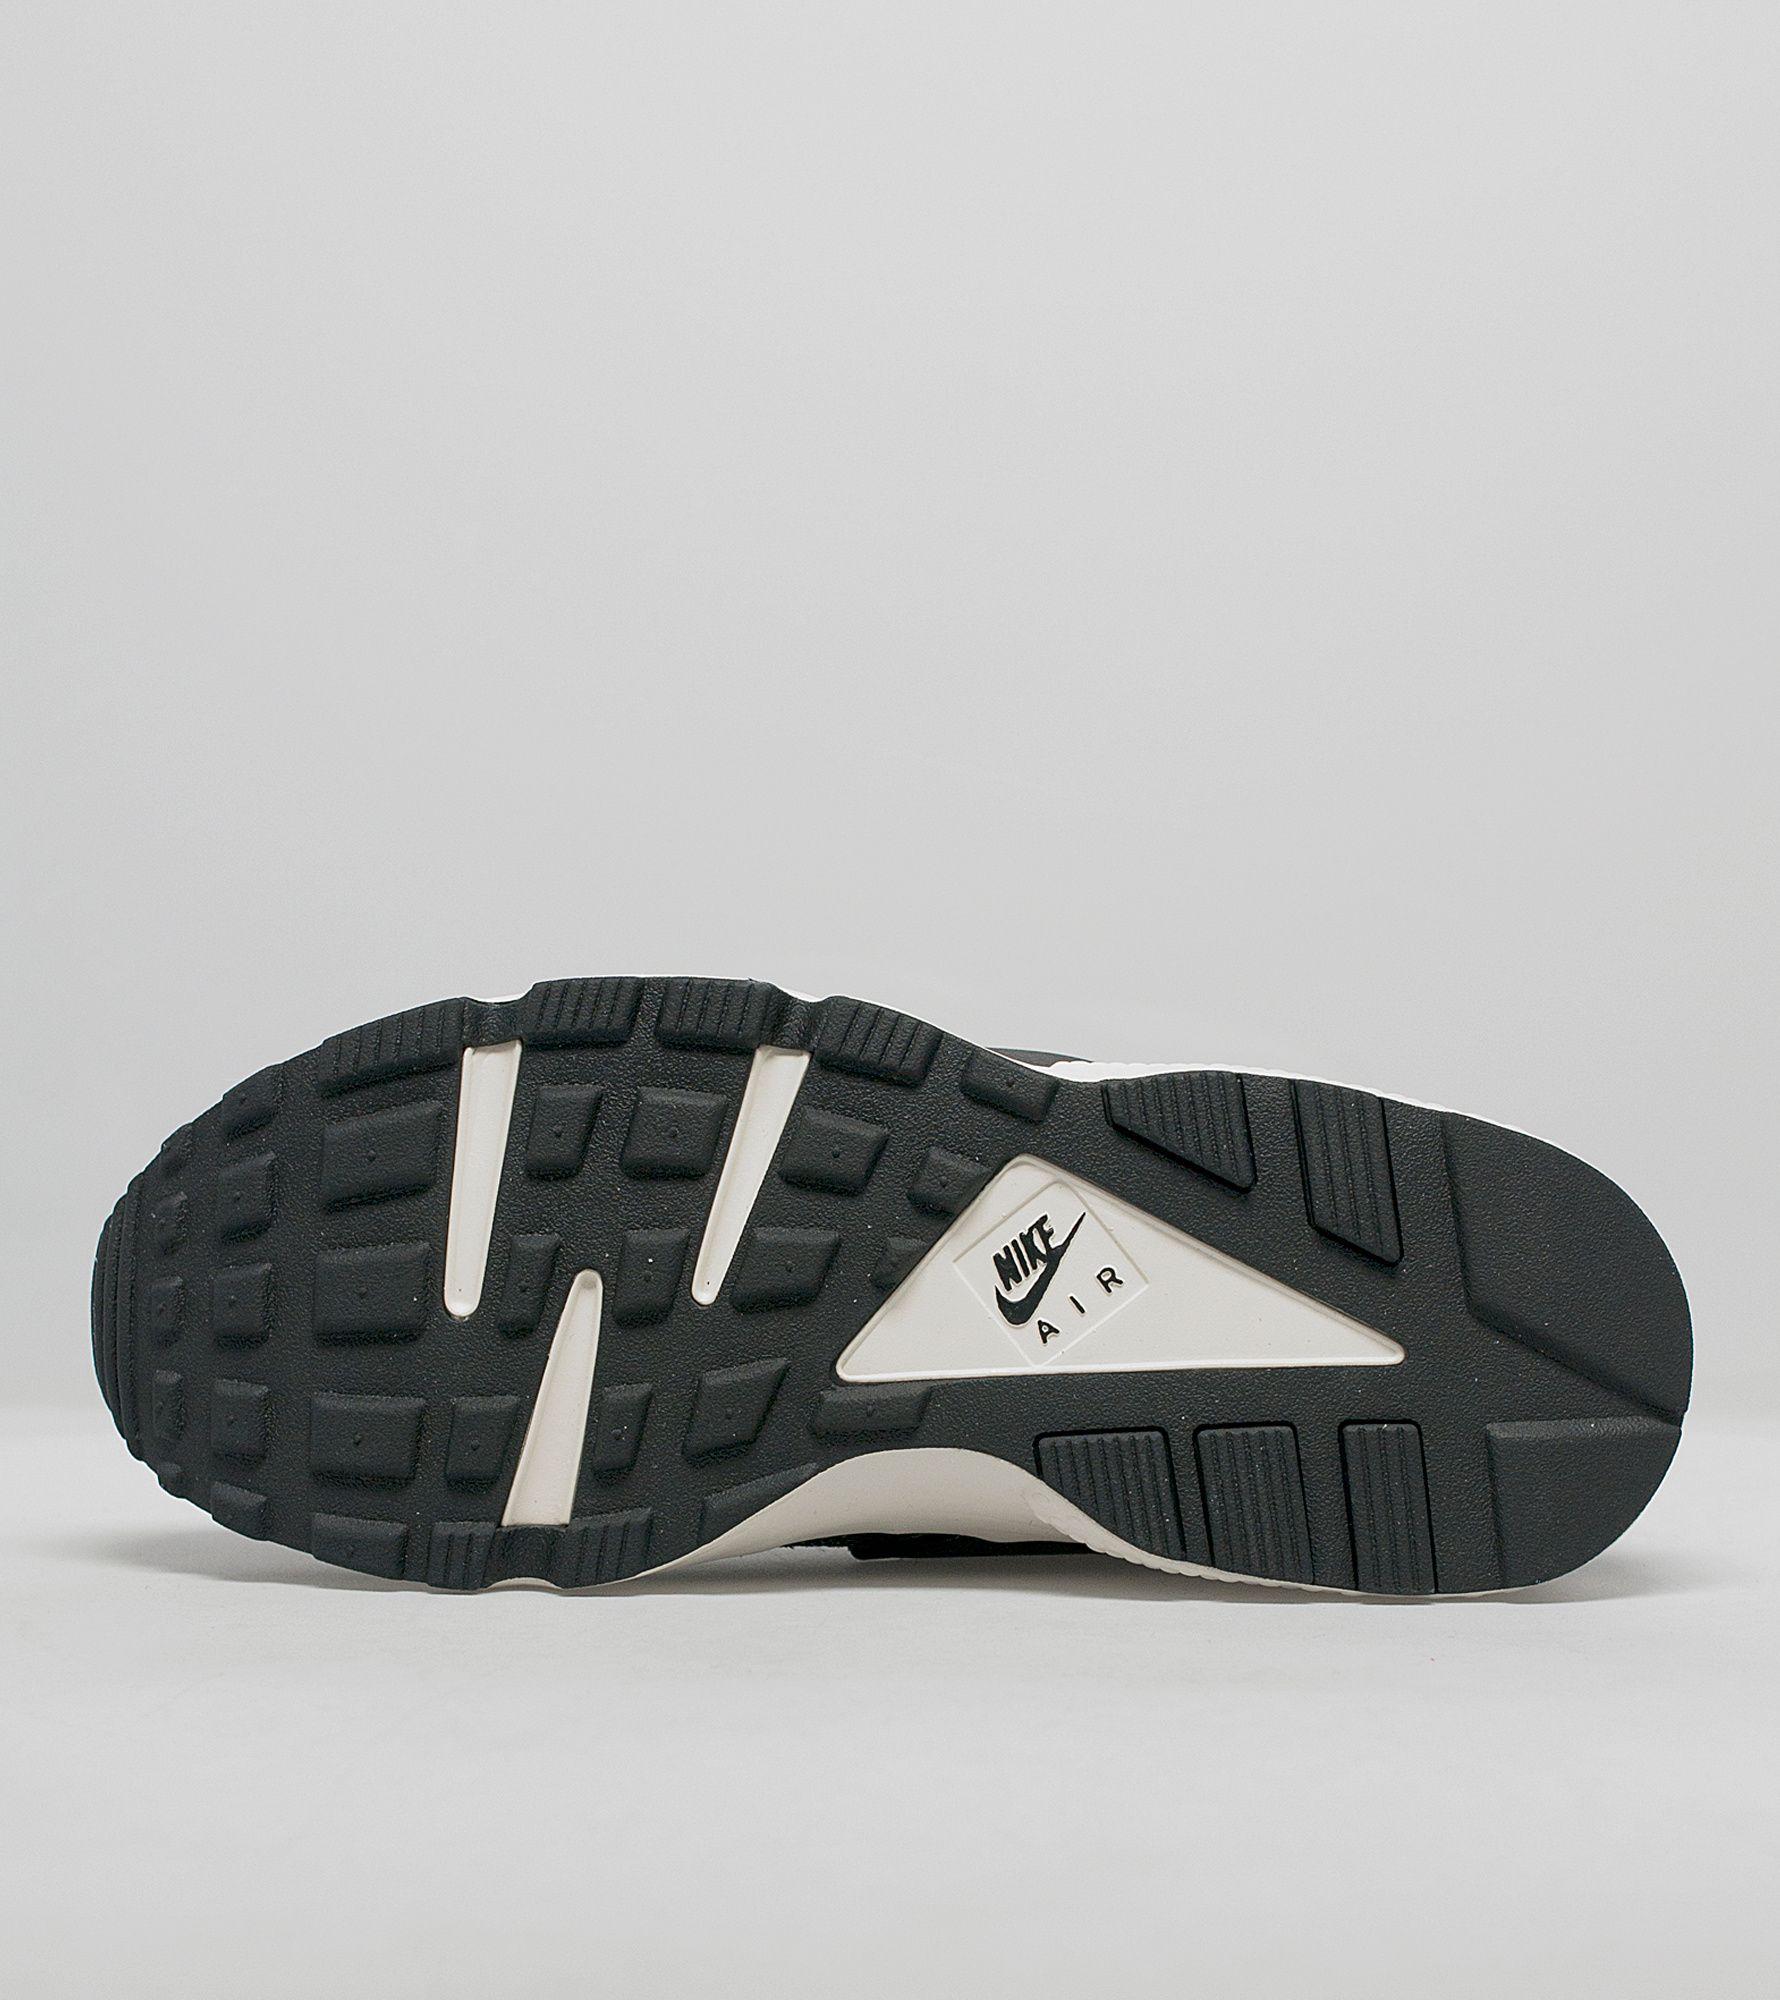 Nike Air Huarache 'Stingray Pack'